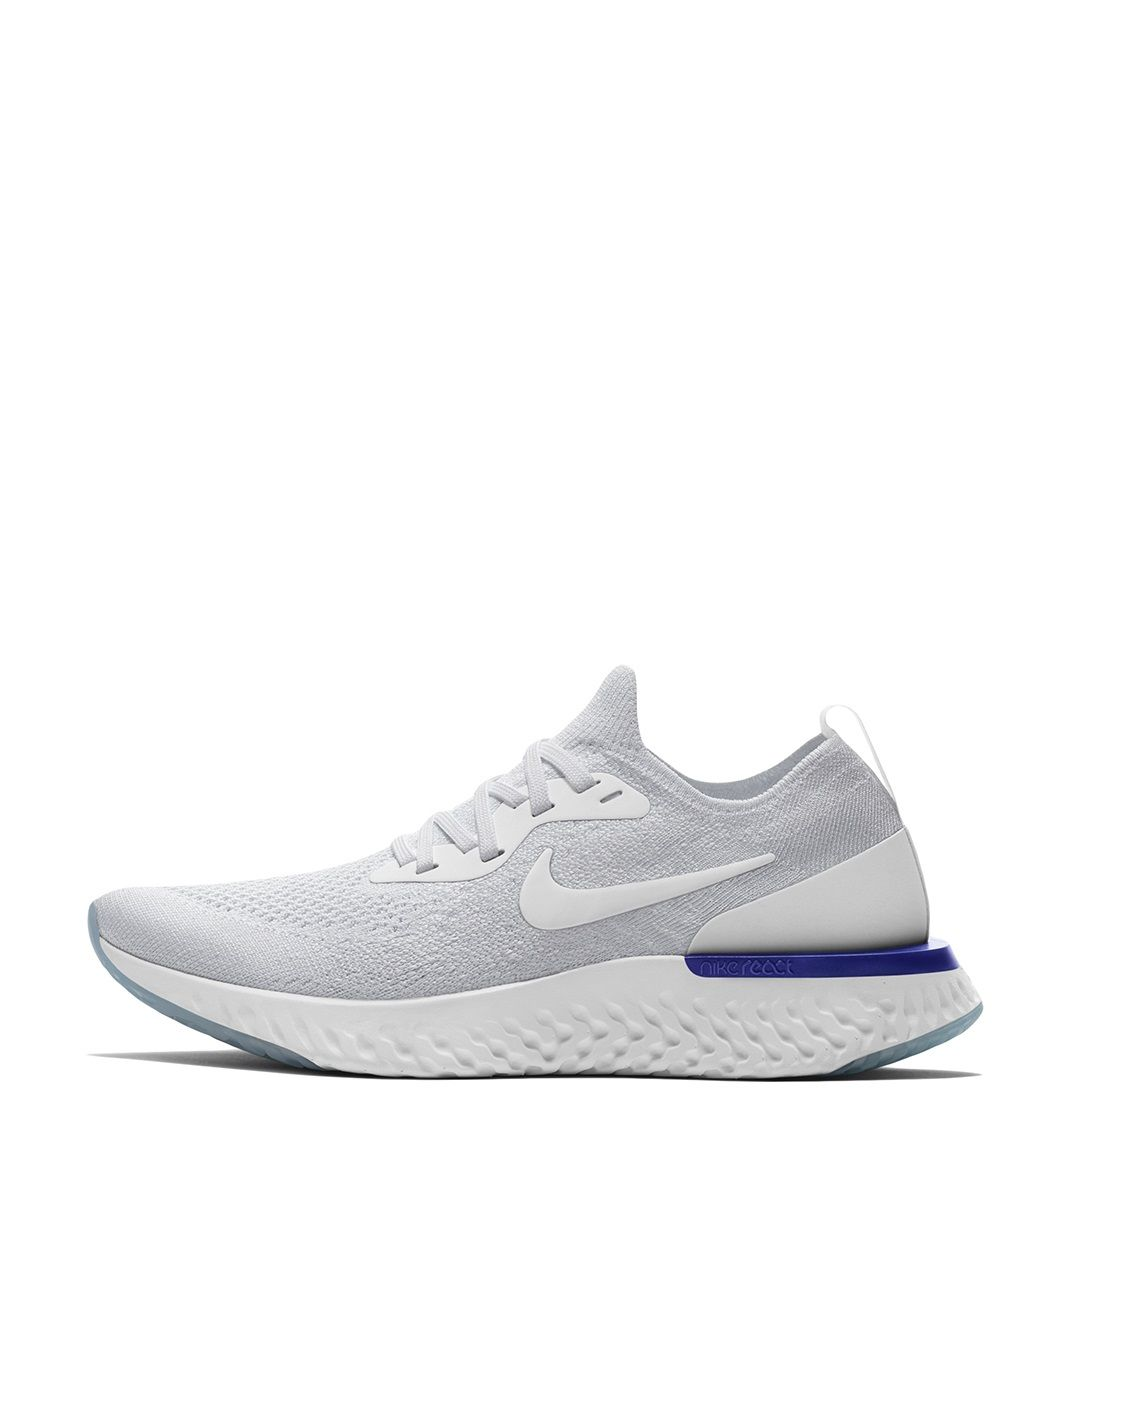 Nike Epic React Flyknit: Grey